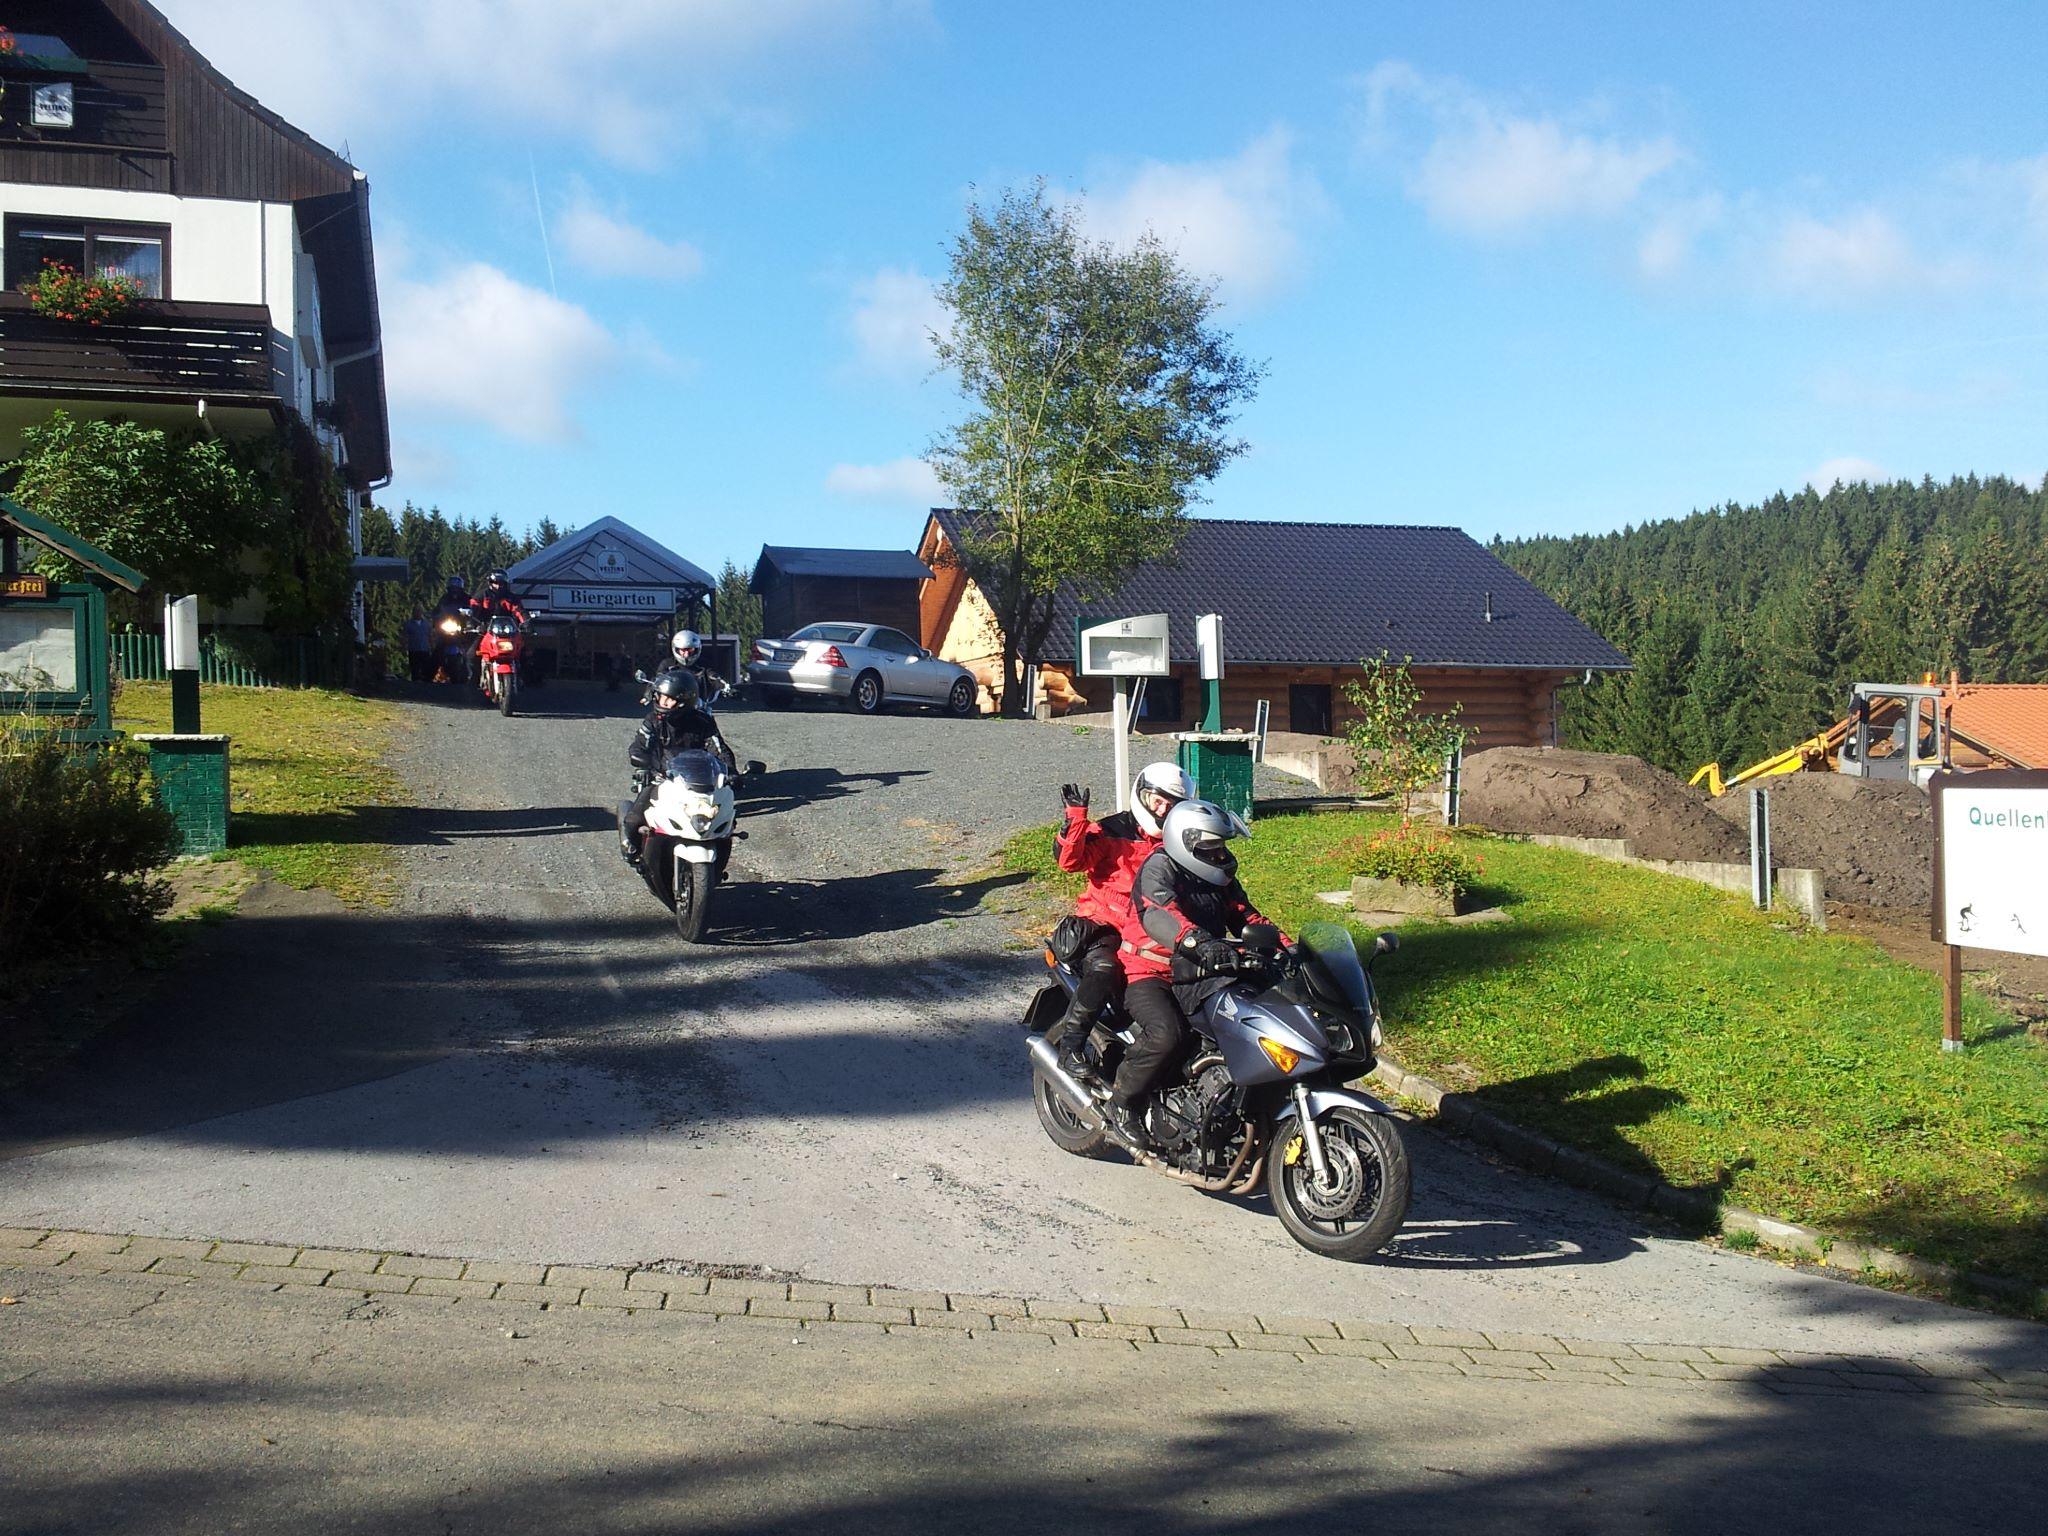 Quellenhof Biker